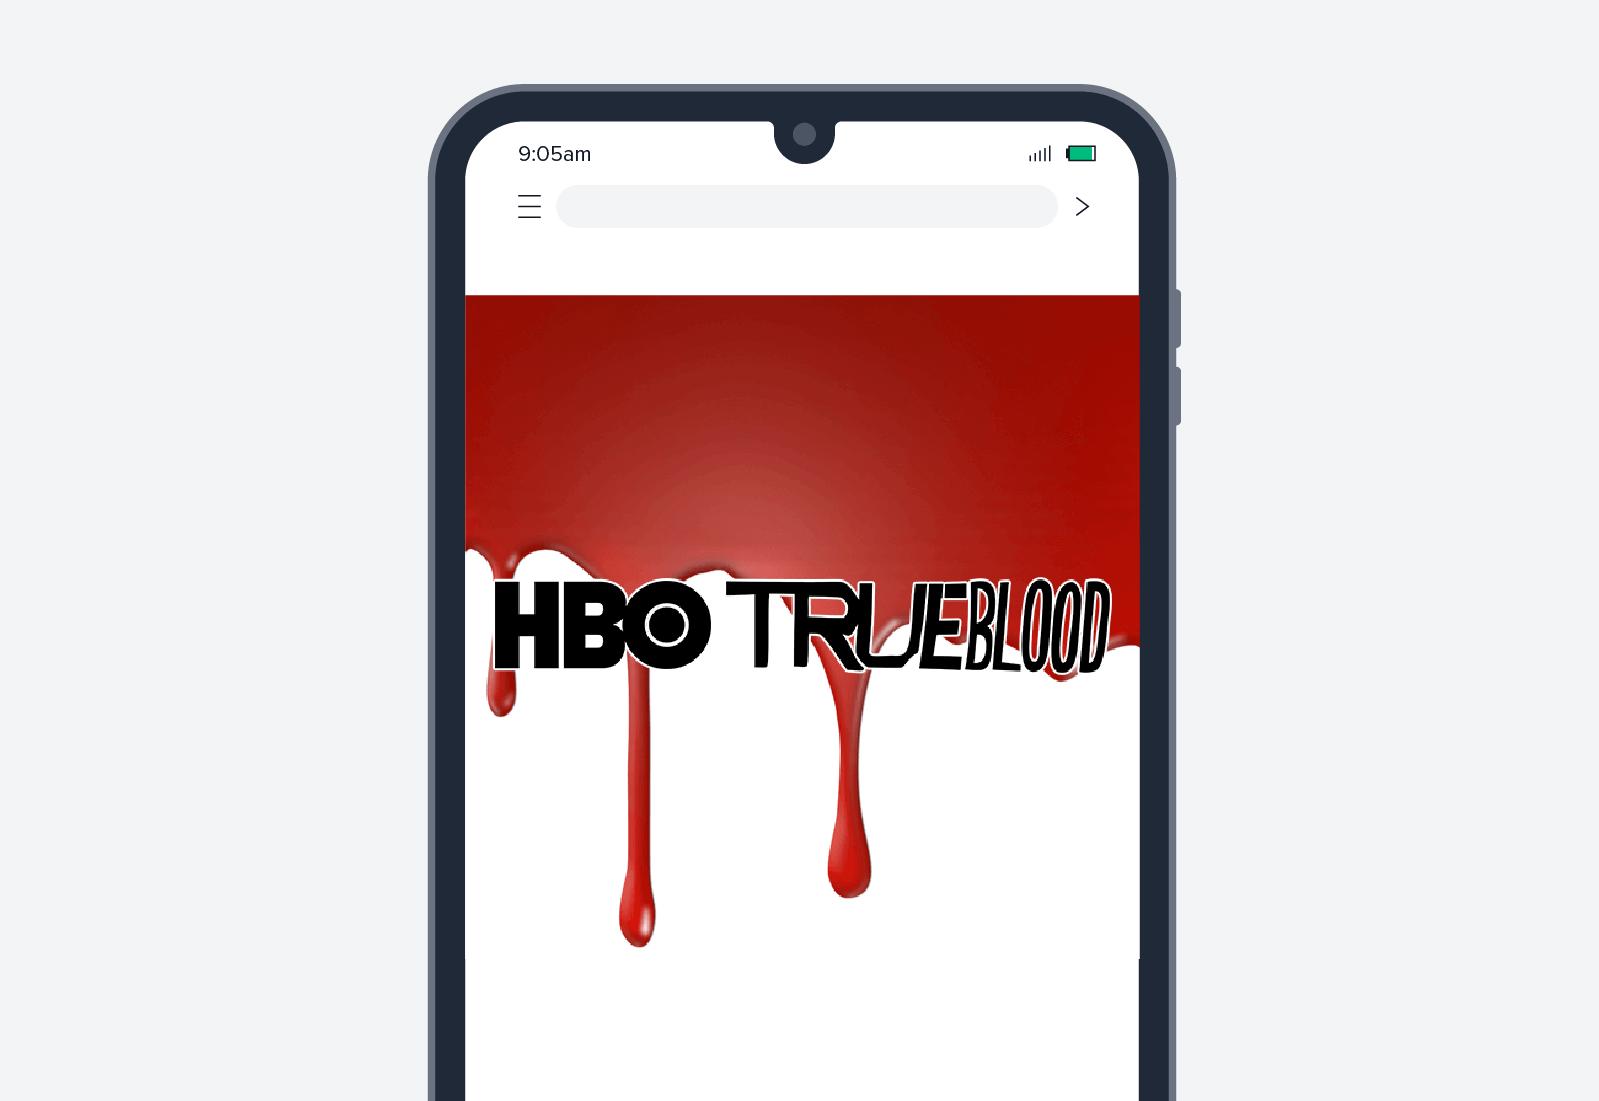 hbo true blood advertisement